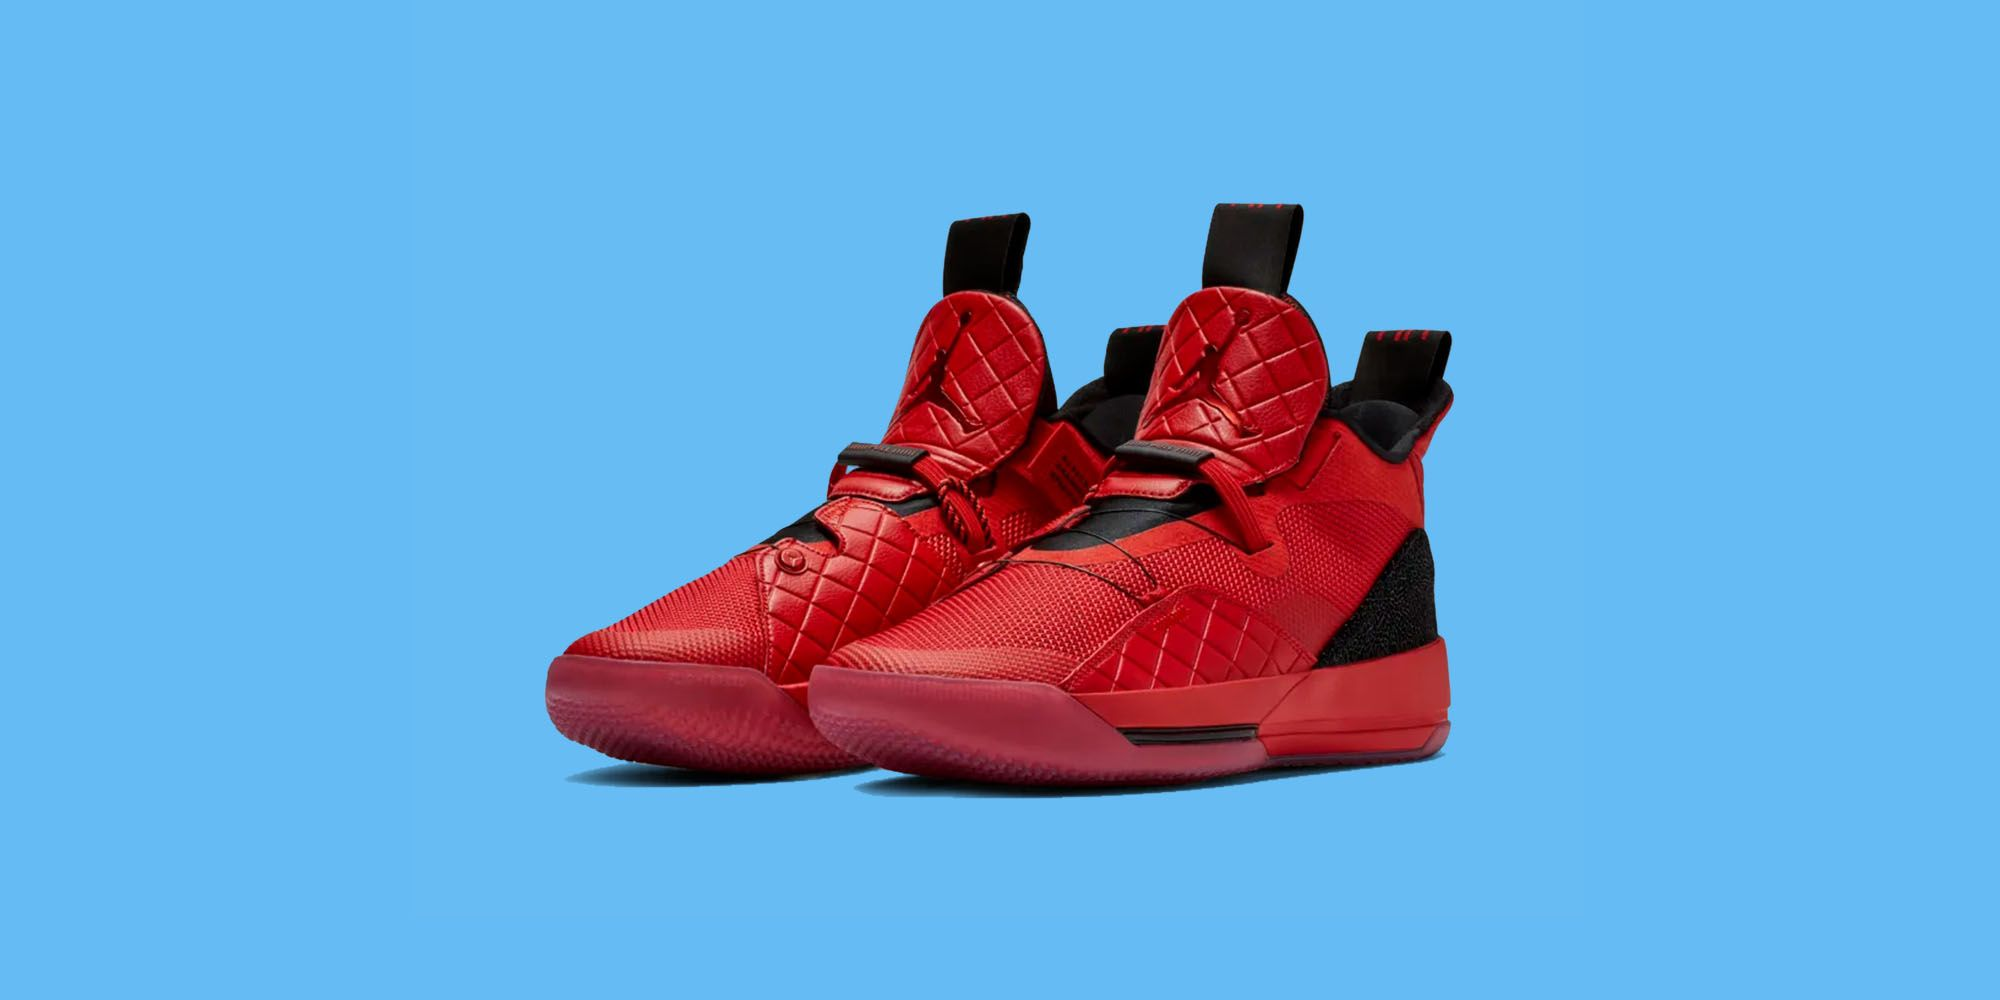 dfef86d2668a1 This Week's Biggest Sneaker Releases - Sneaker Releases 2019